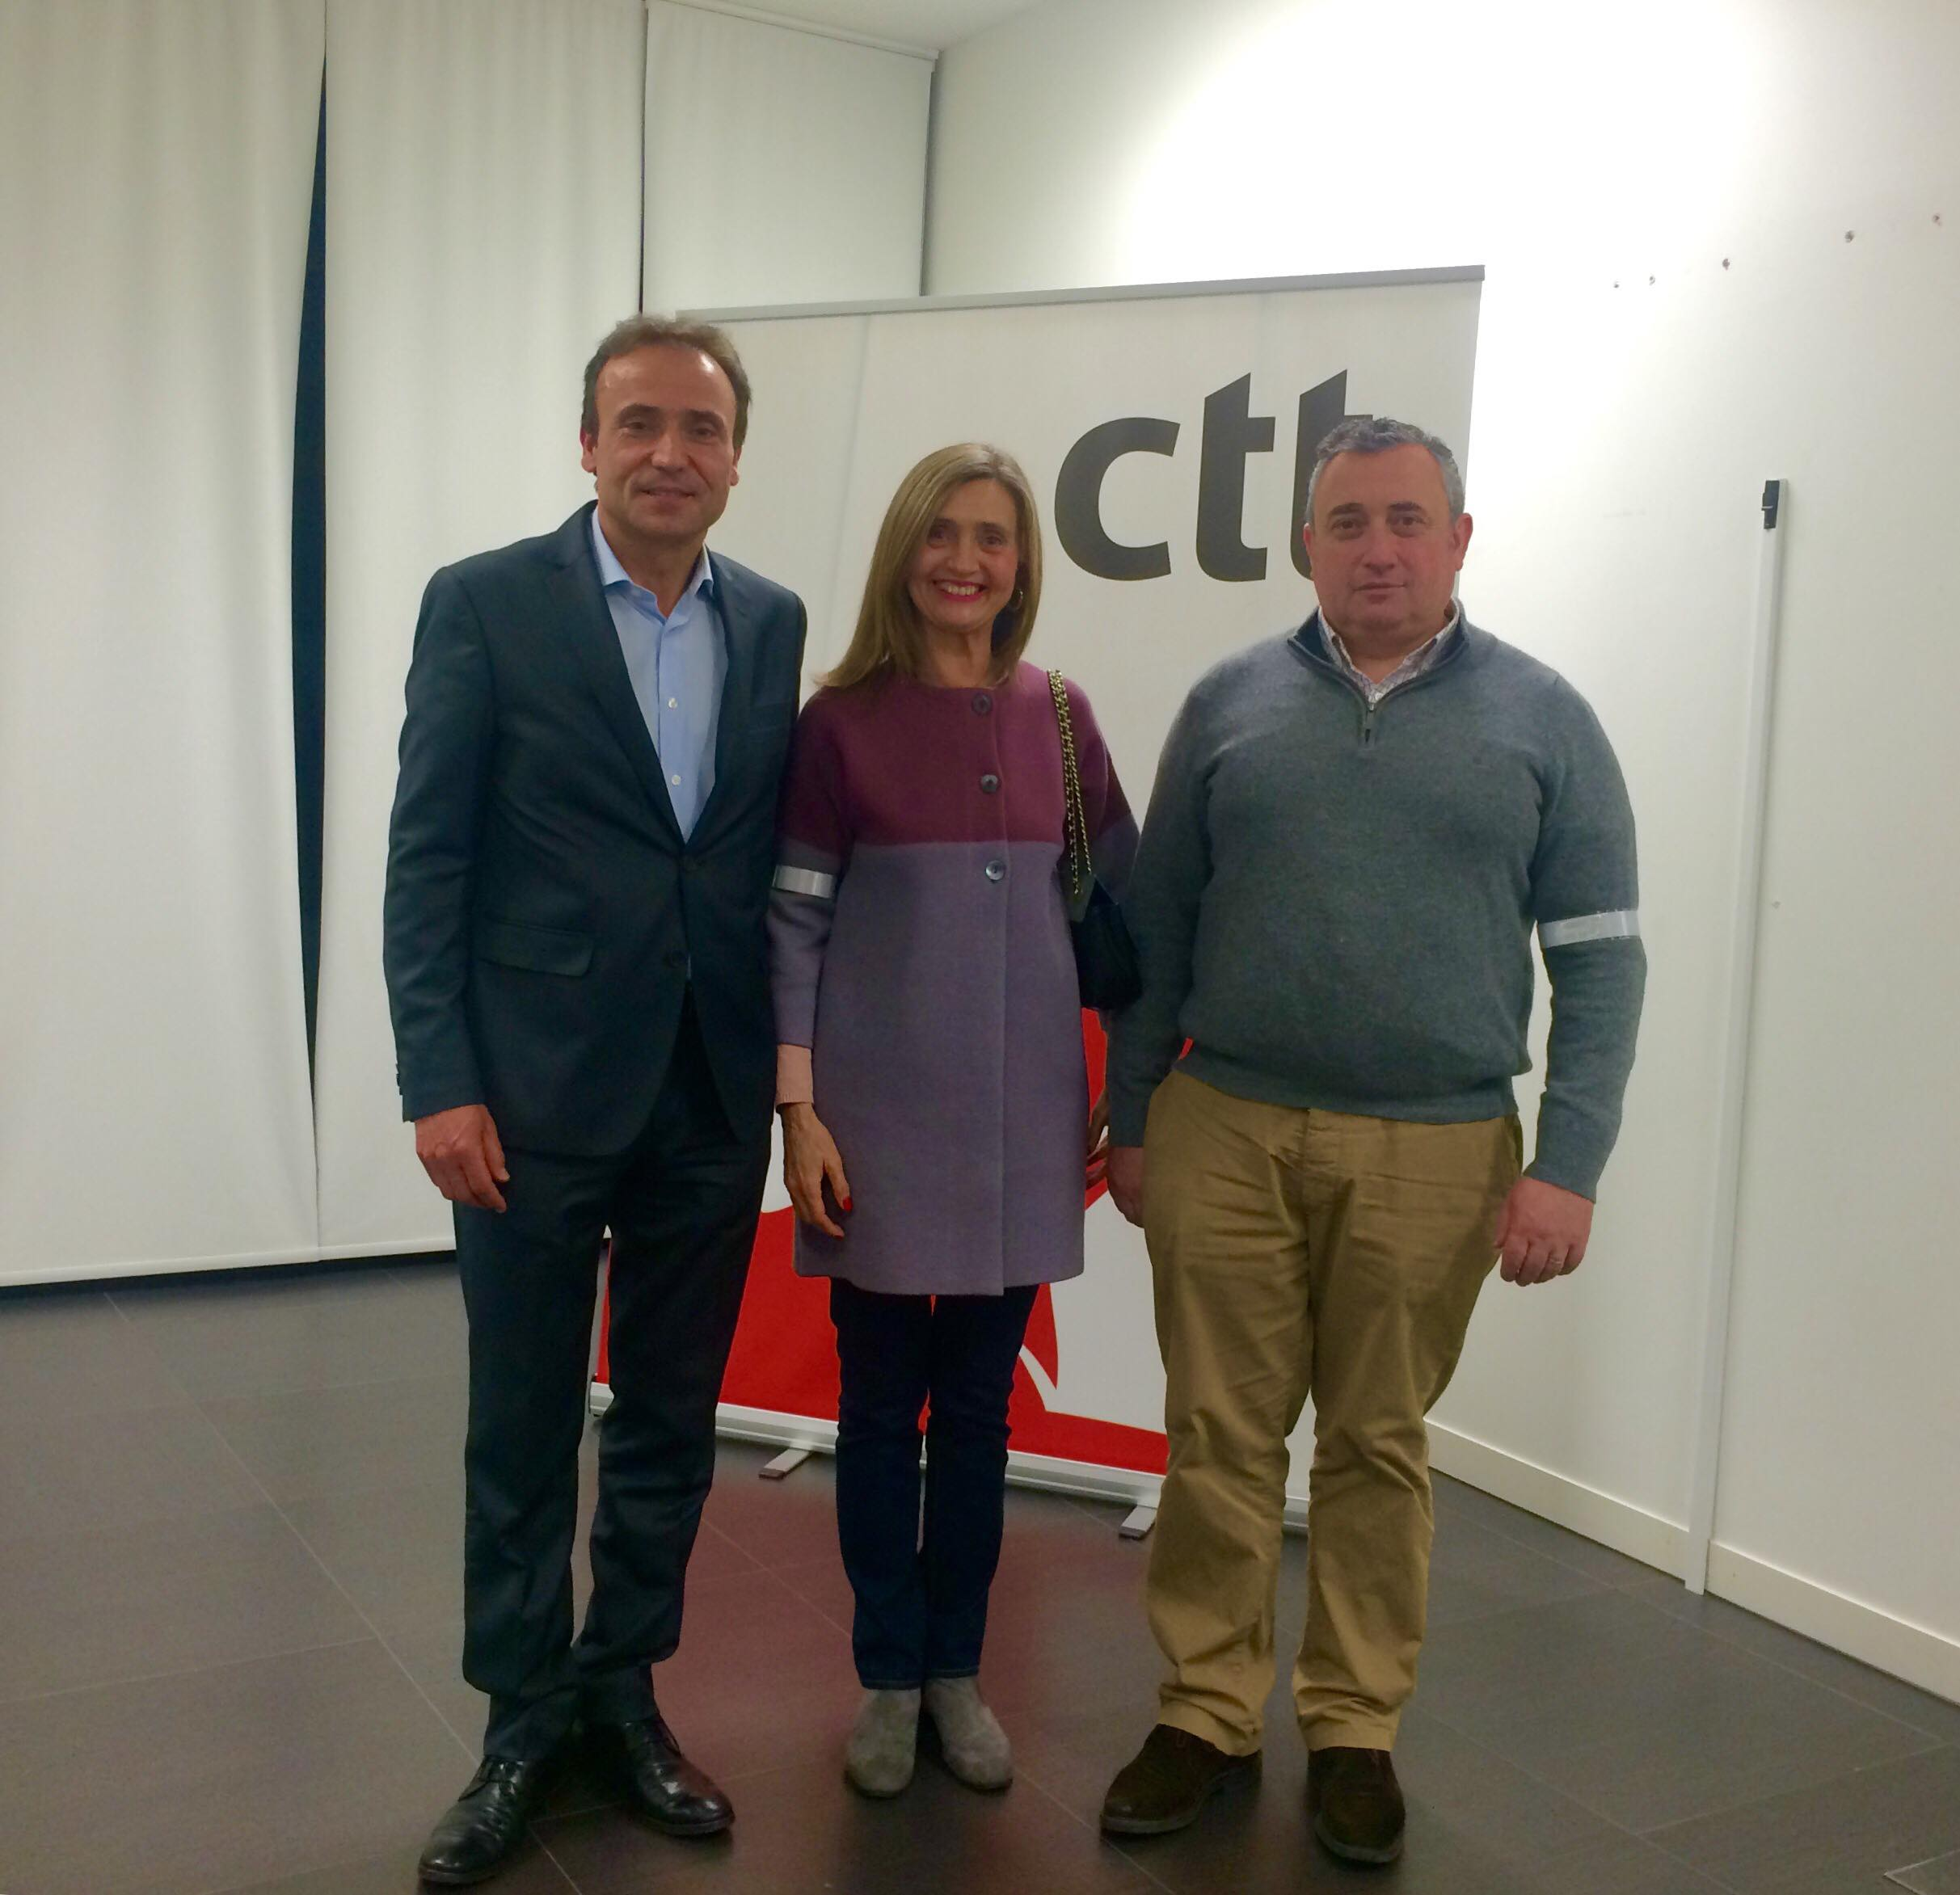 Visita Estudo CTT 13-04-2018_3